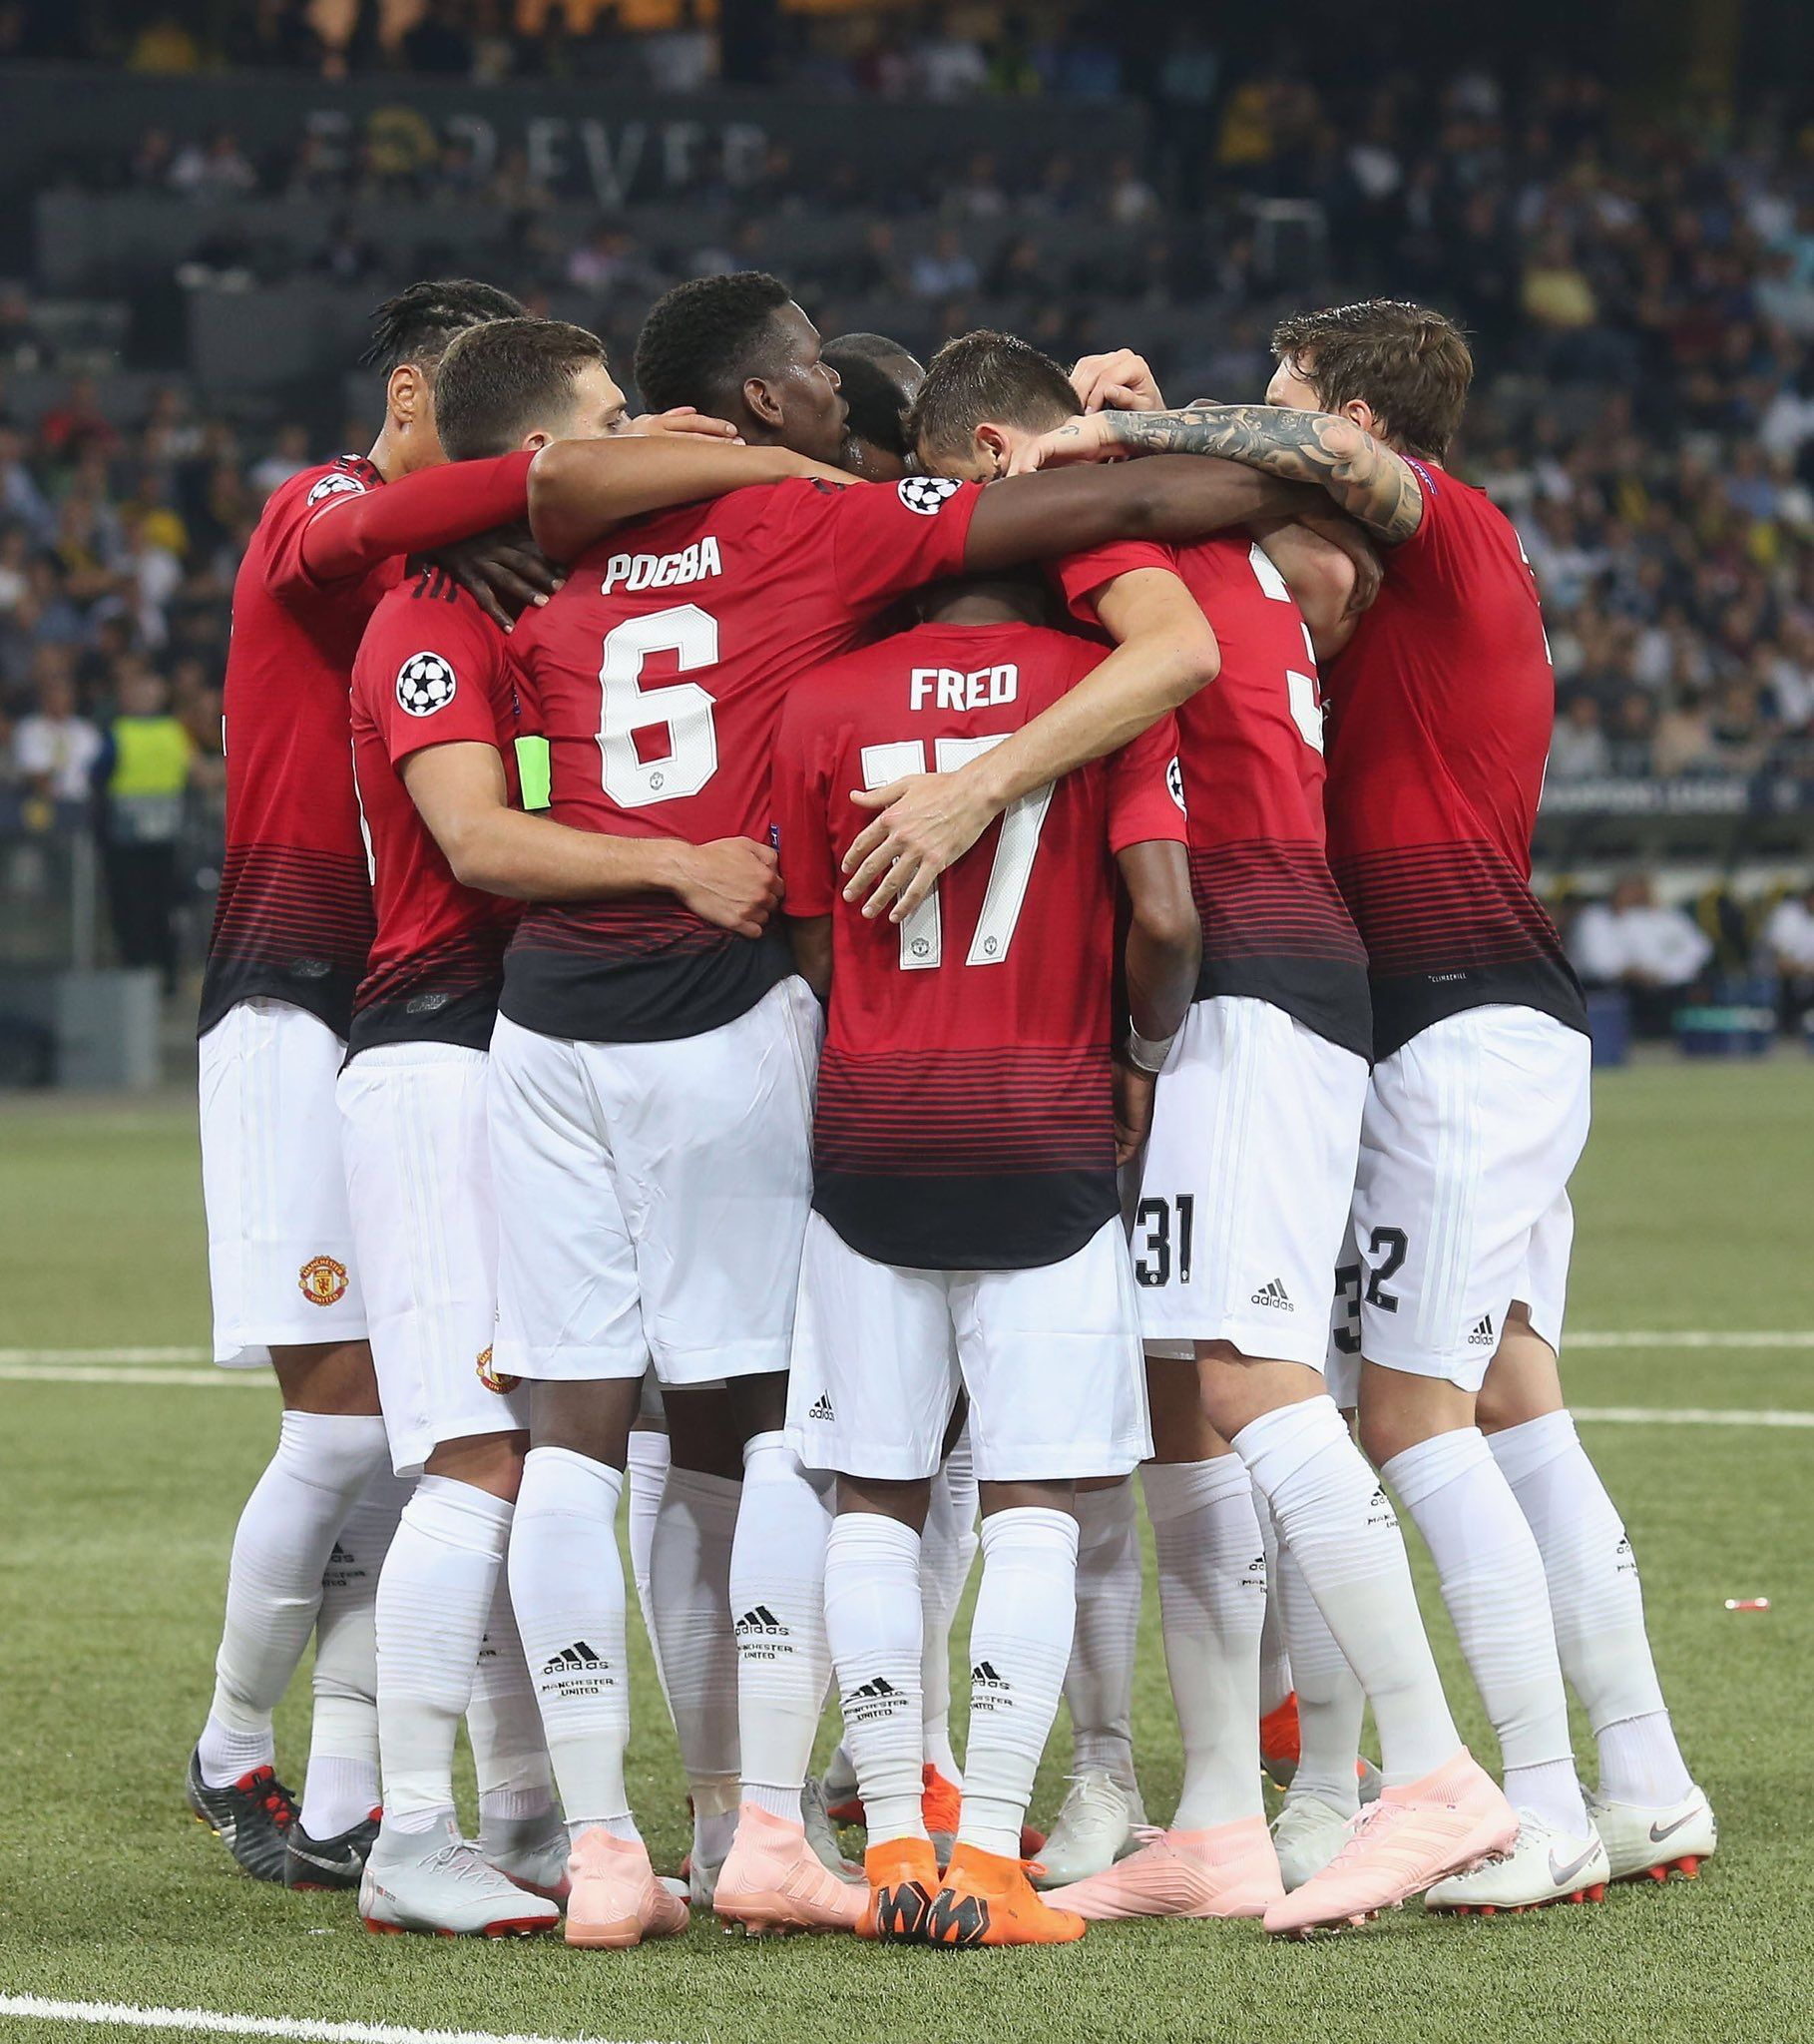 Yb 0 3 Mu Manchester United Football Premier League Champions Manchester United